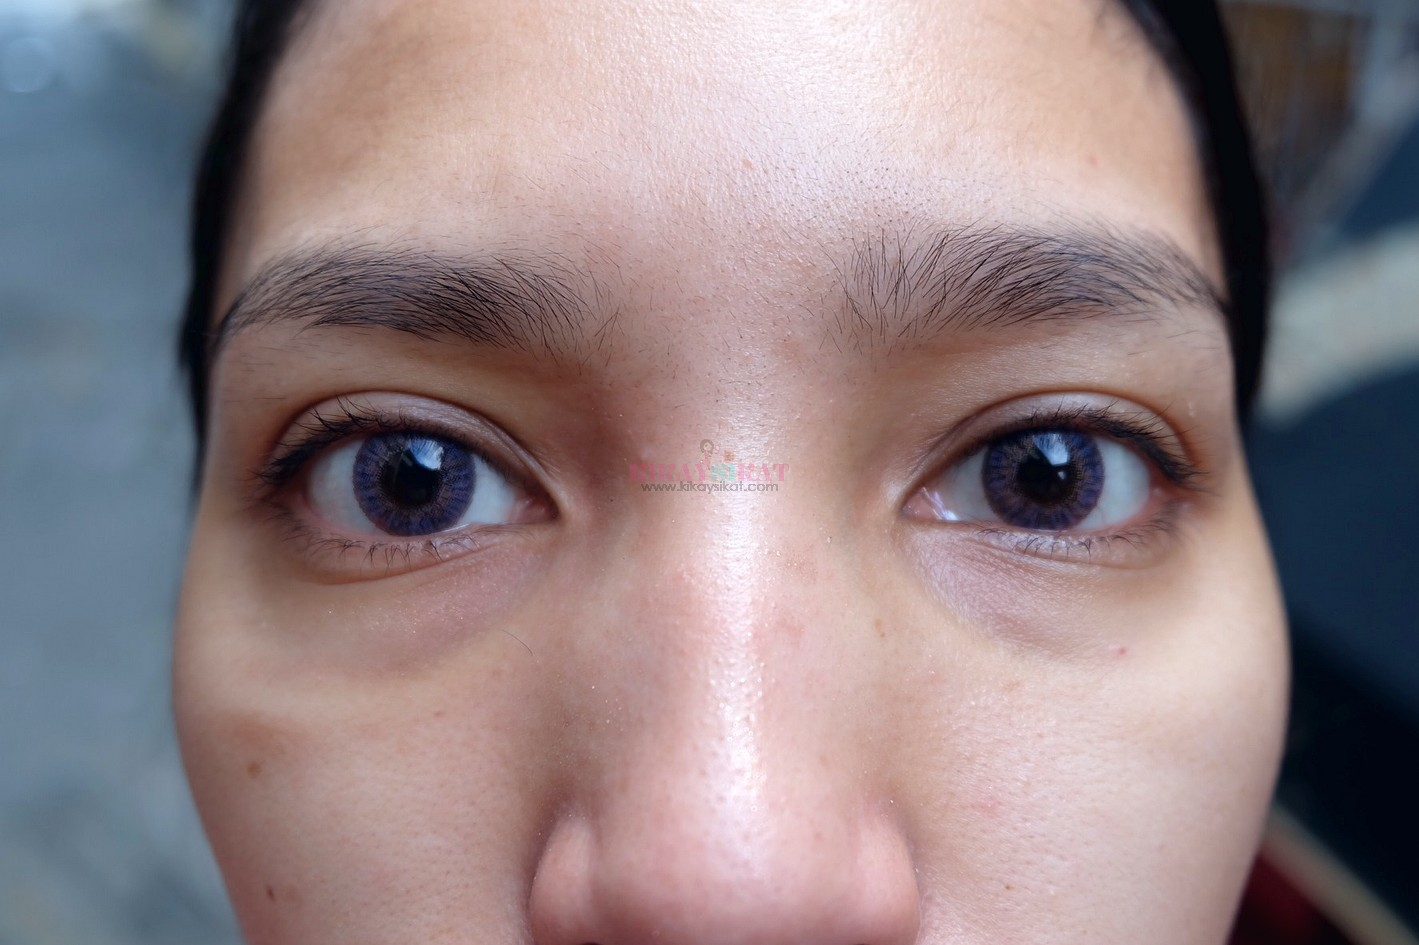 amethyst contact lenses - photo #31